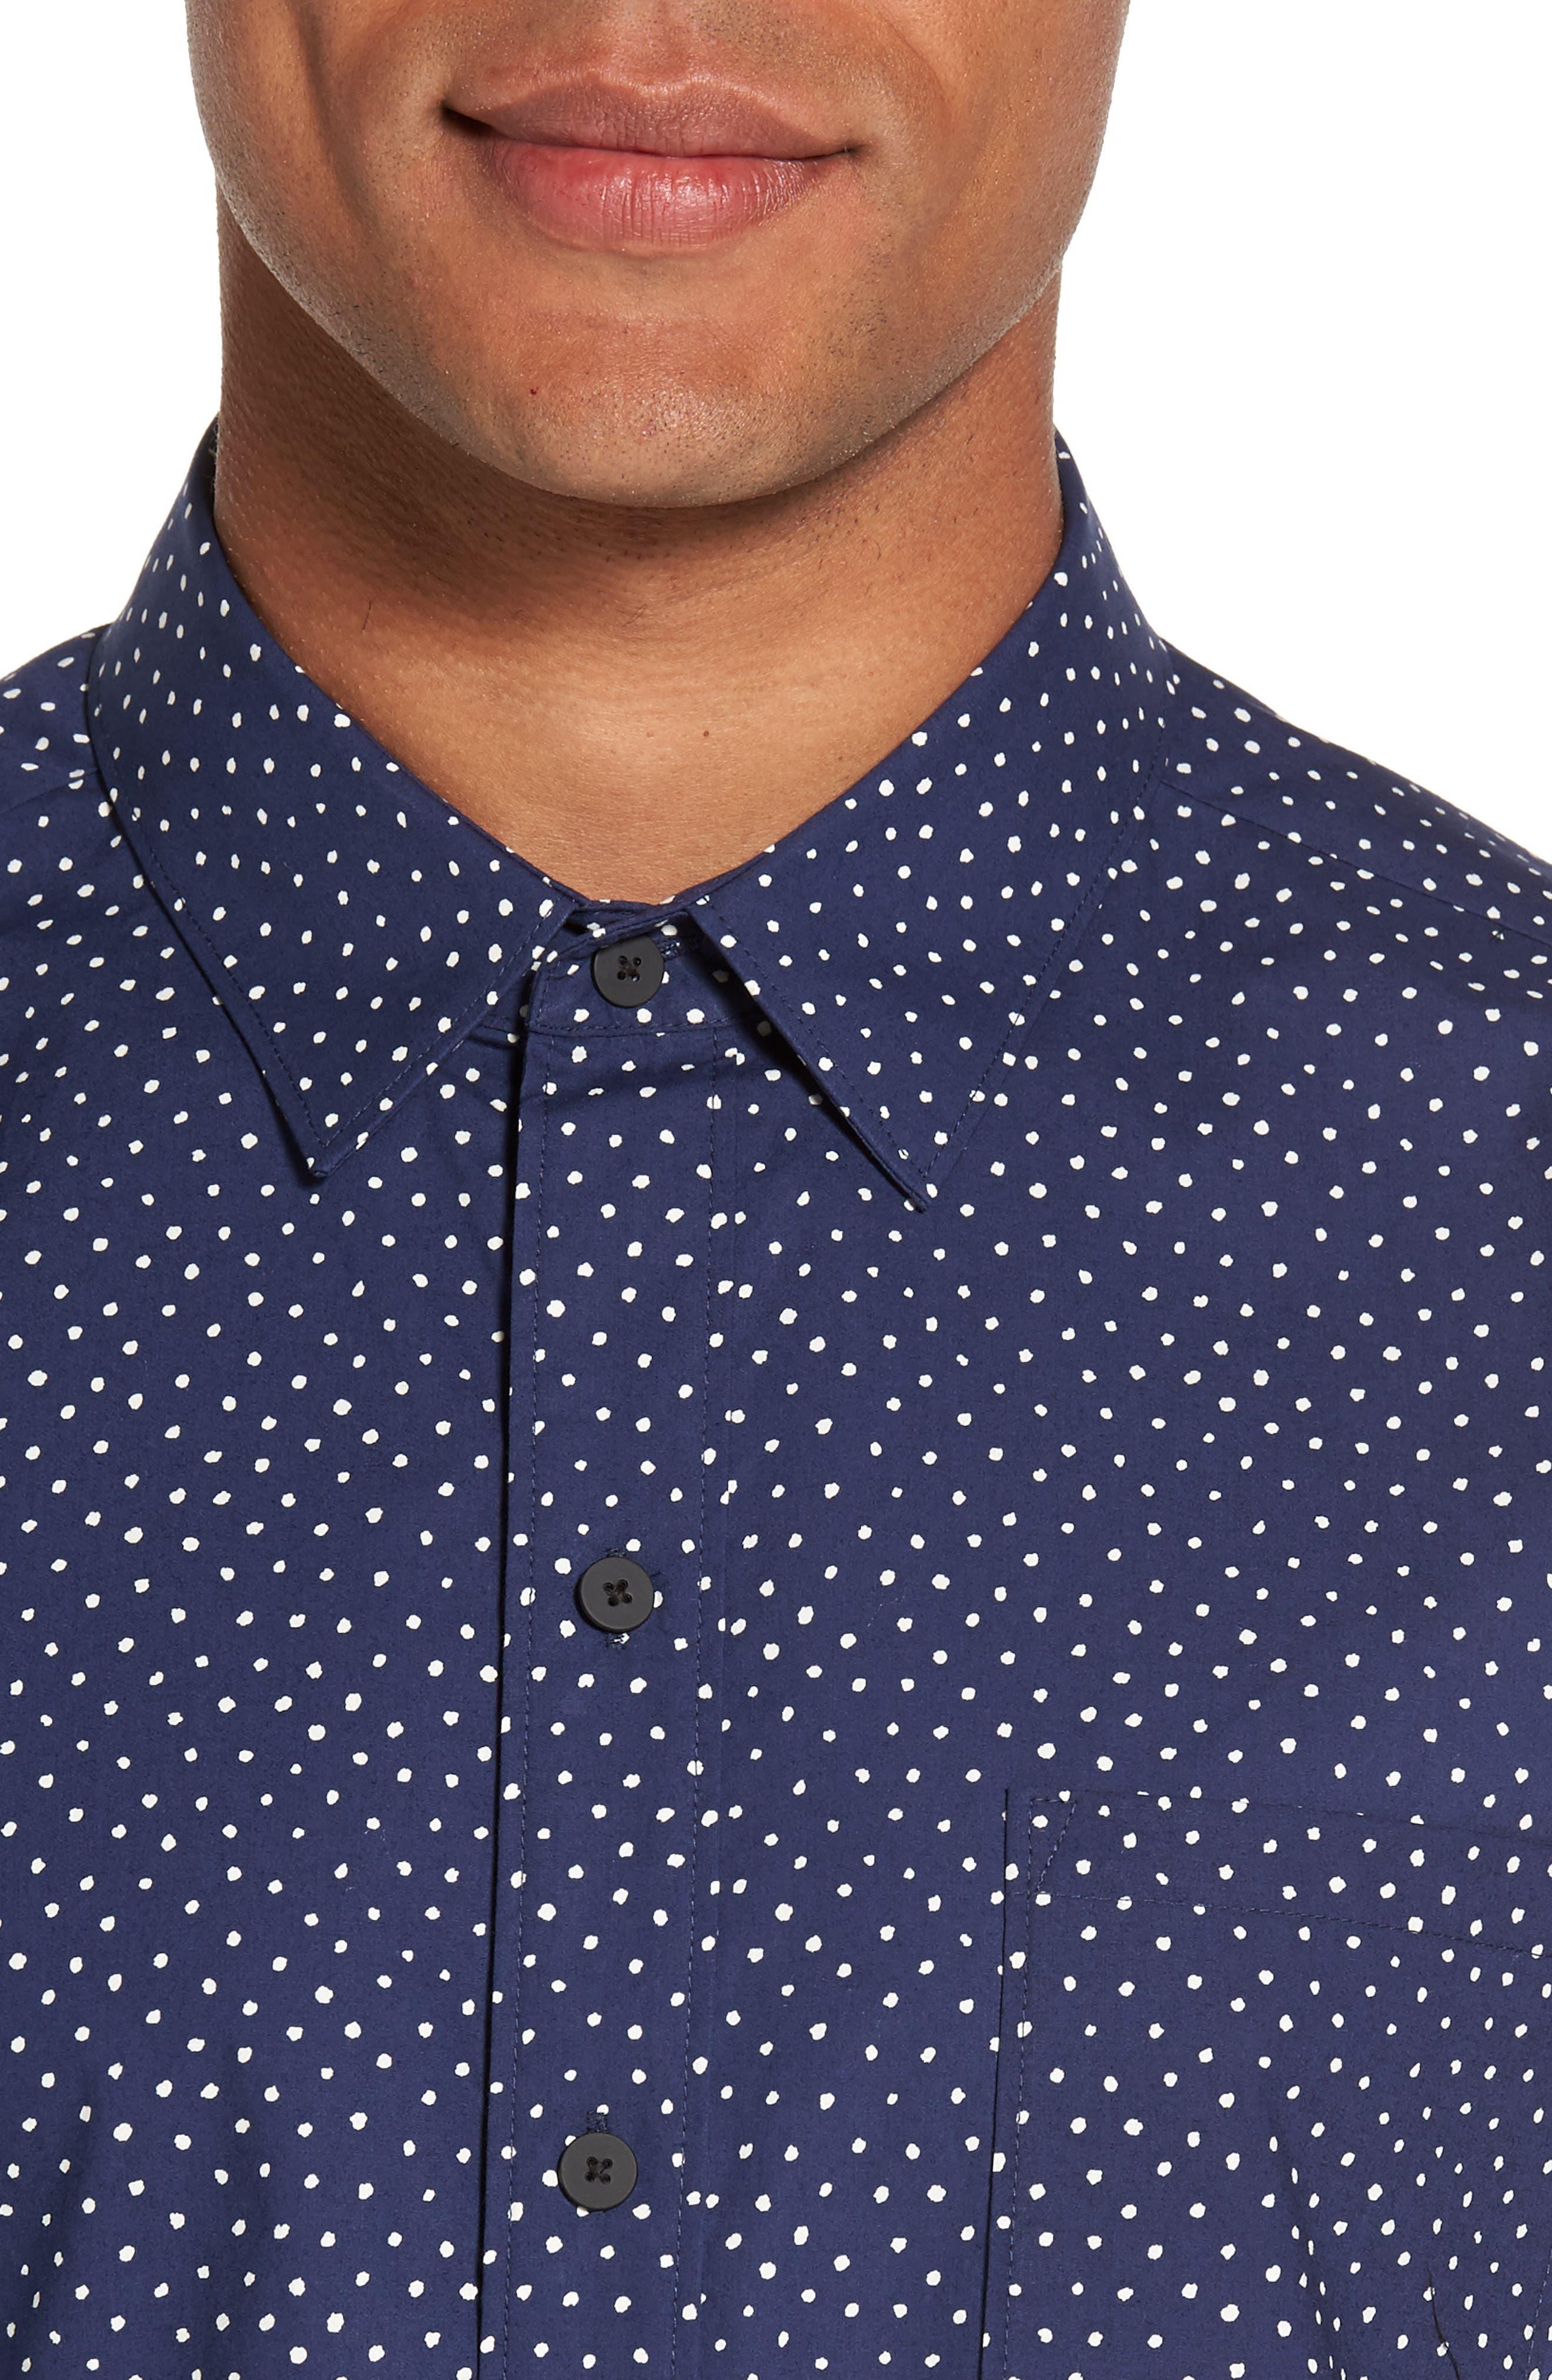 Becker Dot Print Woven Shirt,                             Alternate thumbnail 8, color,